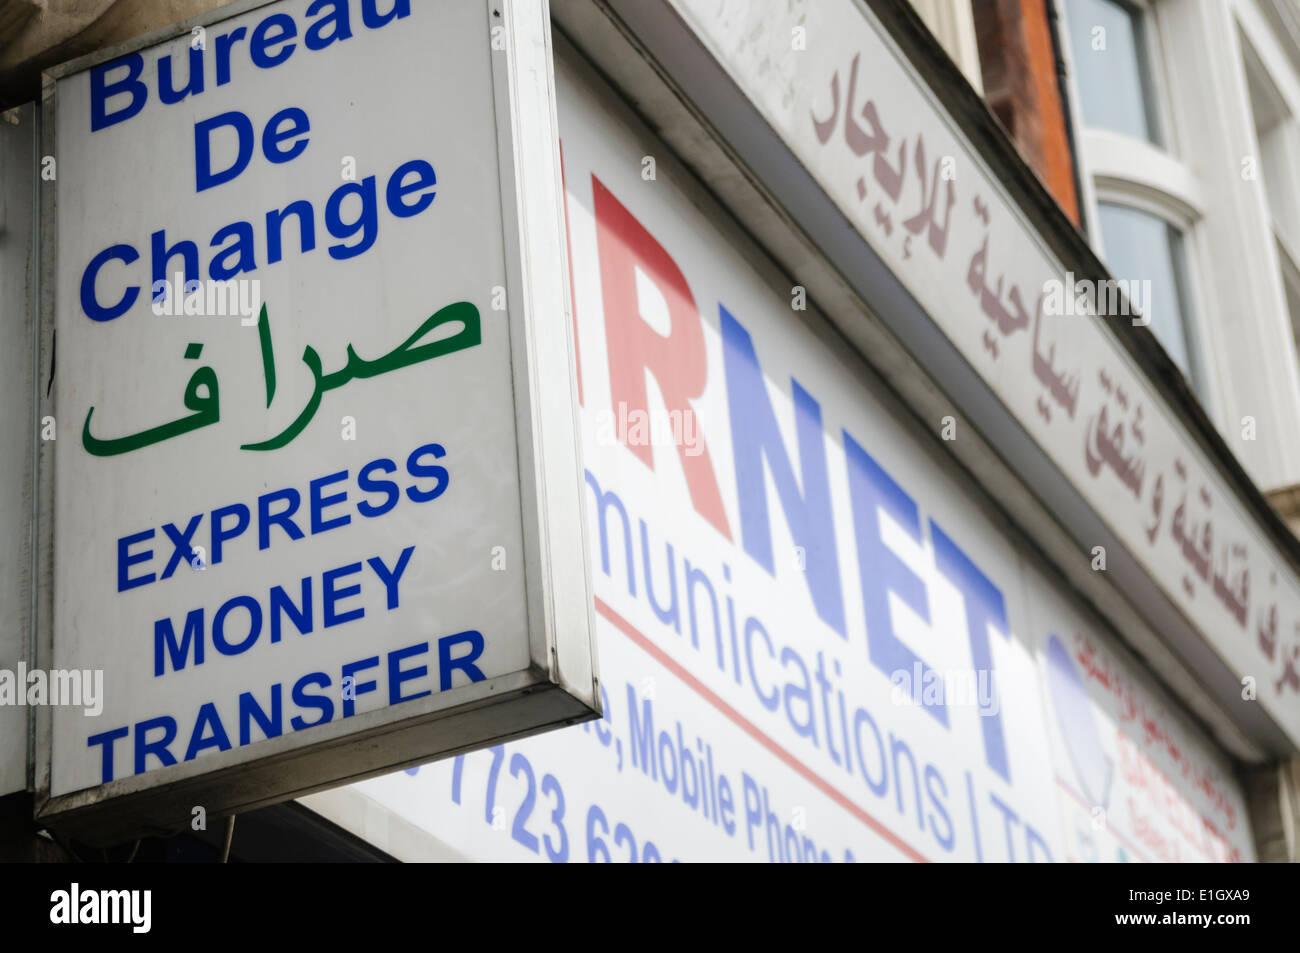 Bureau de Change Express money transfer in arabic Stock Photo